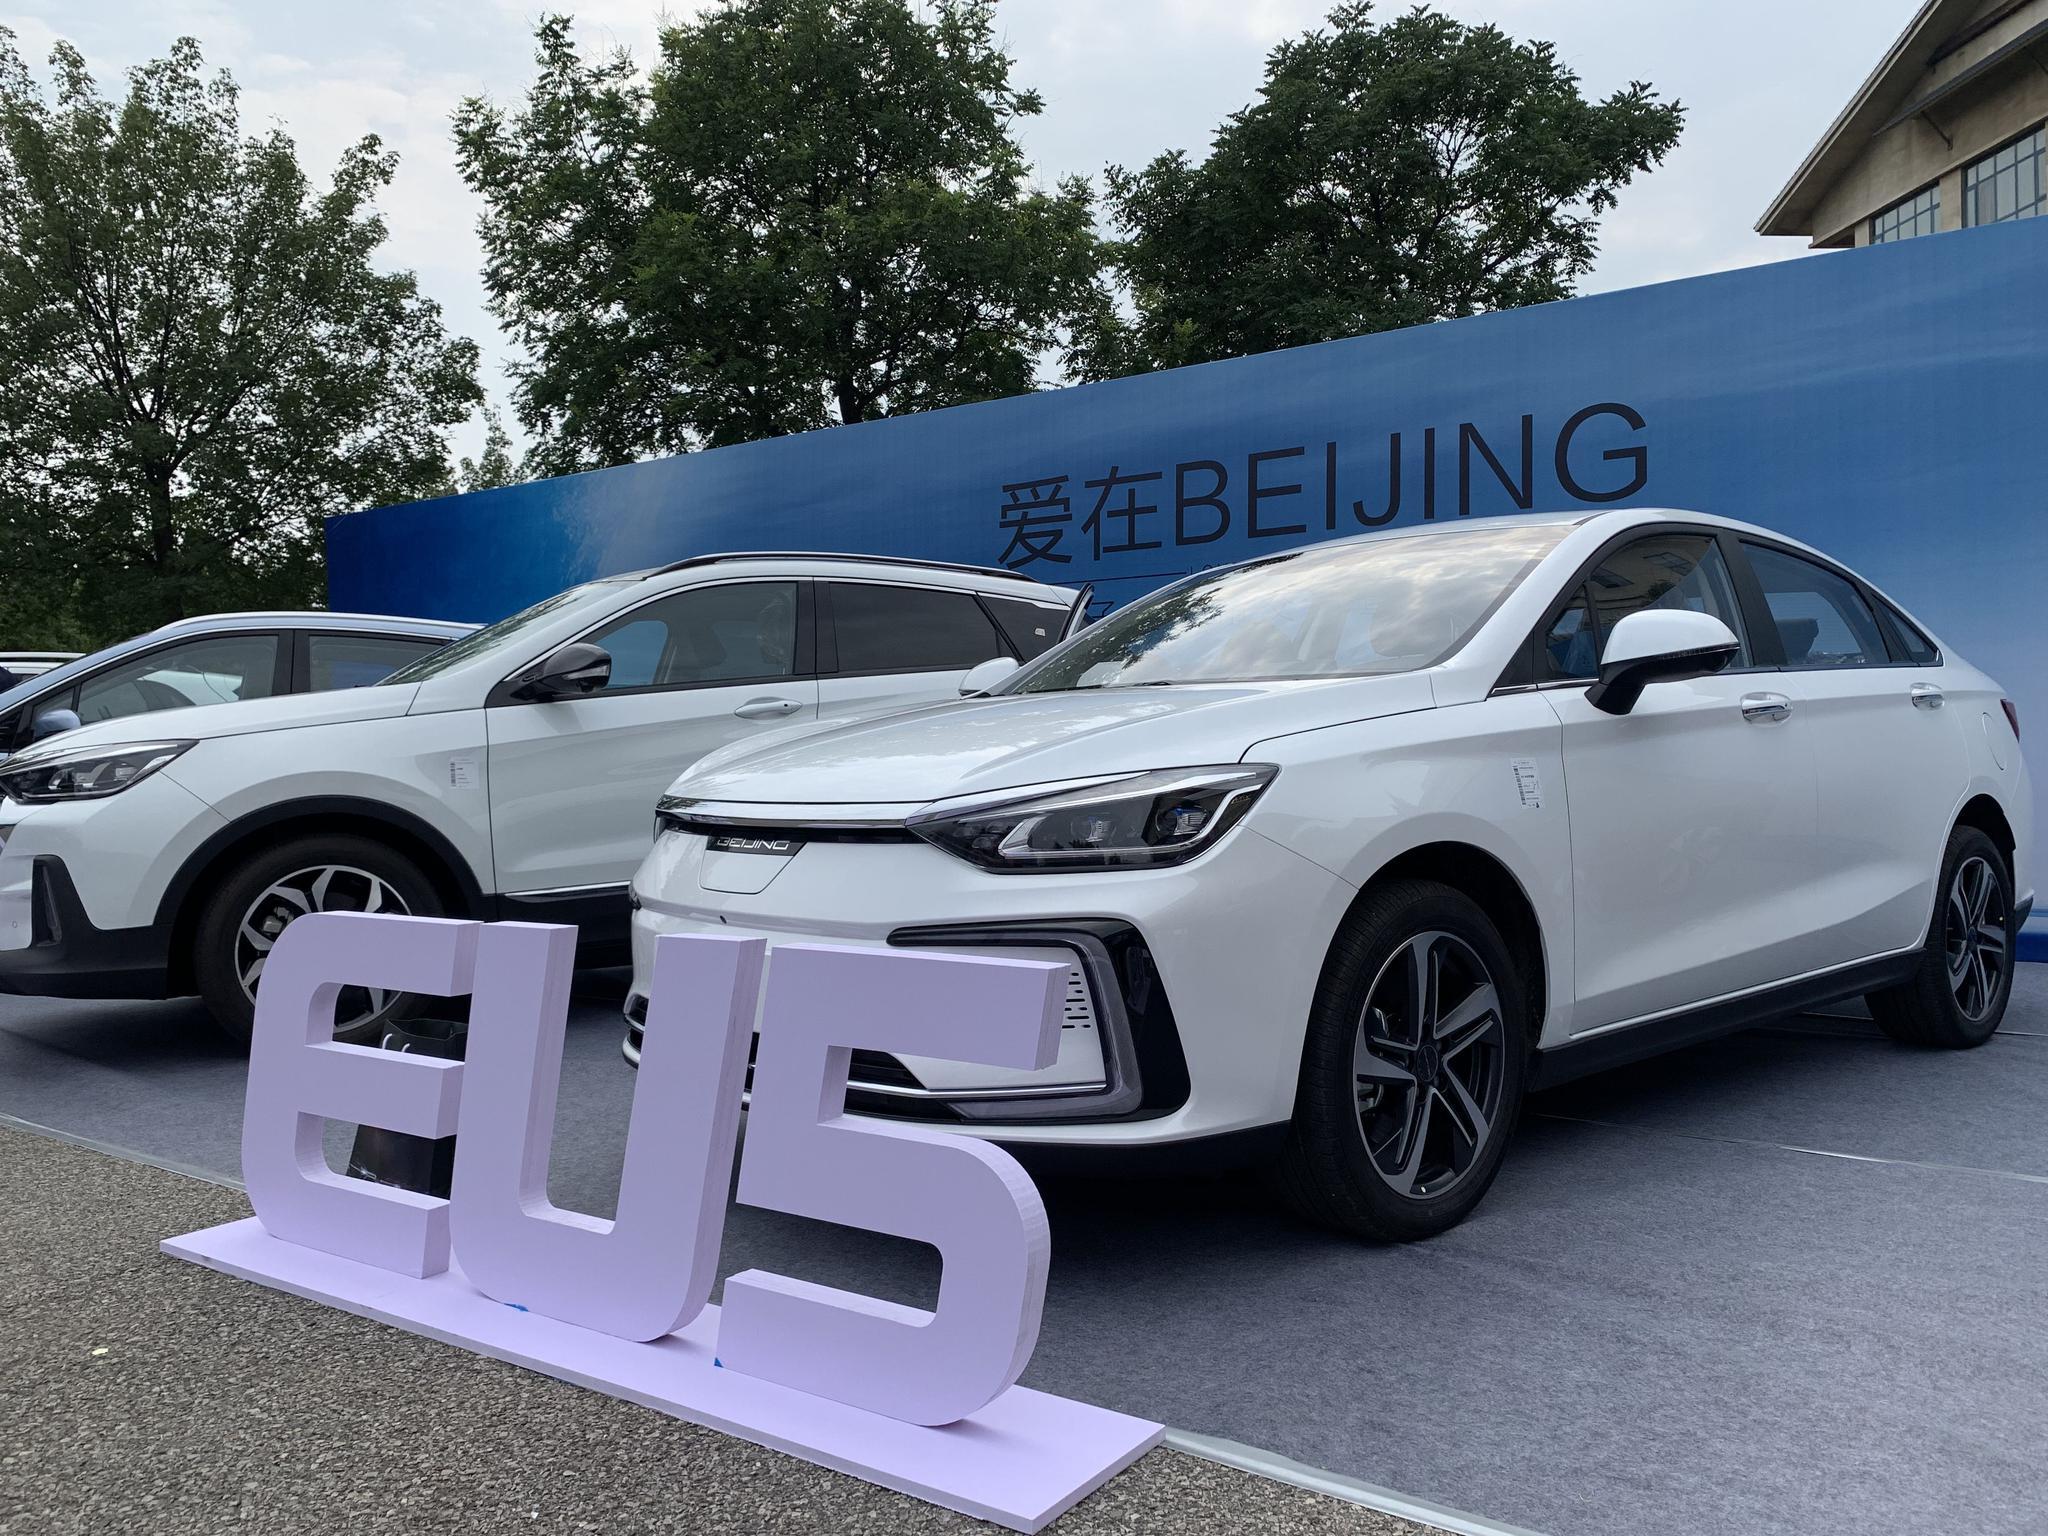 BEIJING汽车消费季正式启动,将发放10亿元新能源消费券